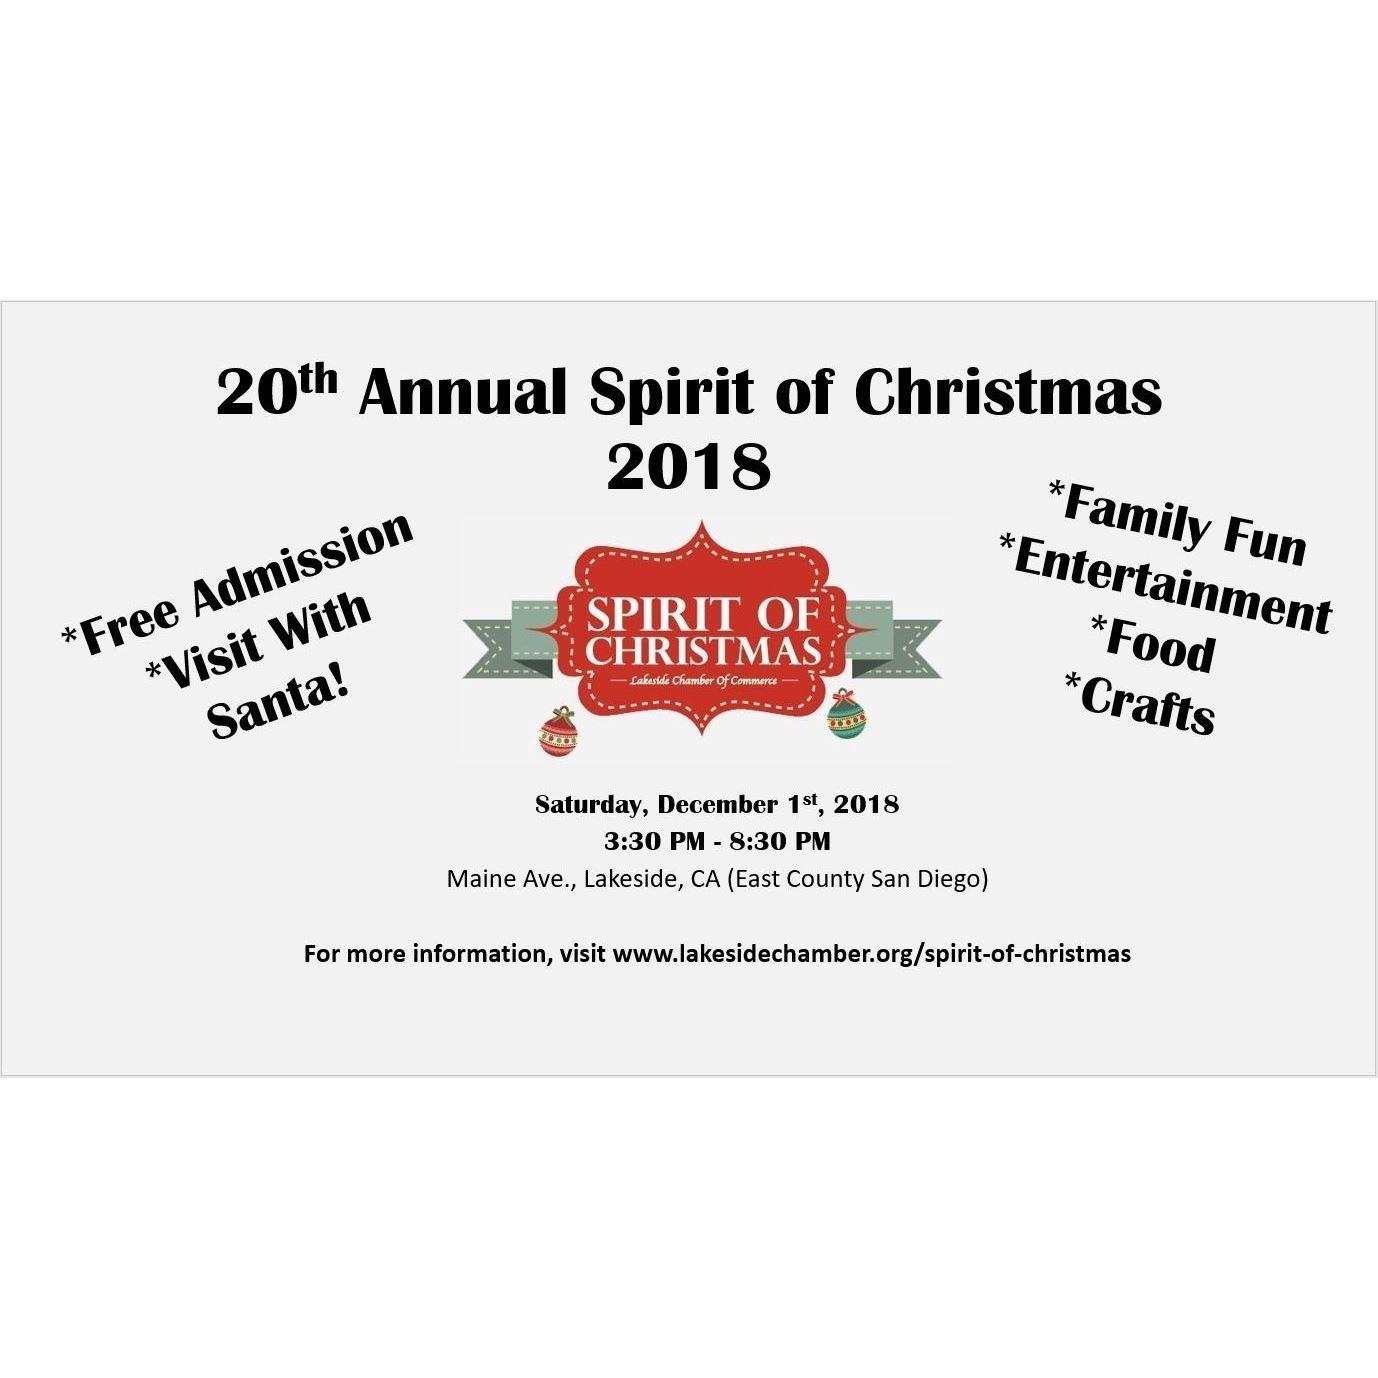 Dec 1st Free Spirit of Christmas on Maine Ave, Lakeside